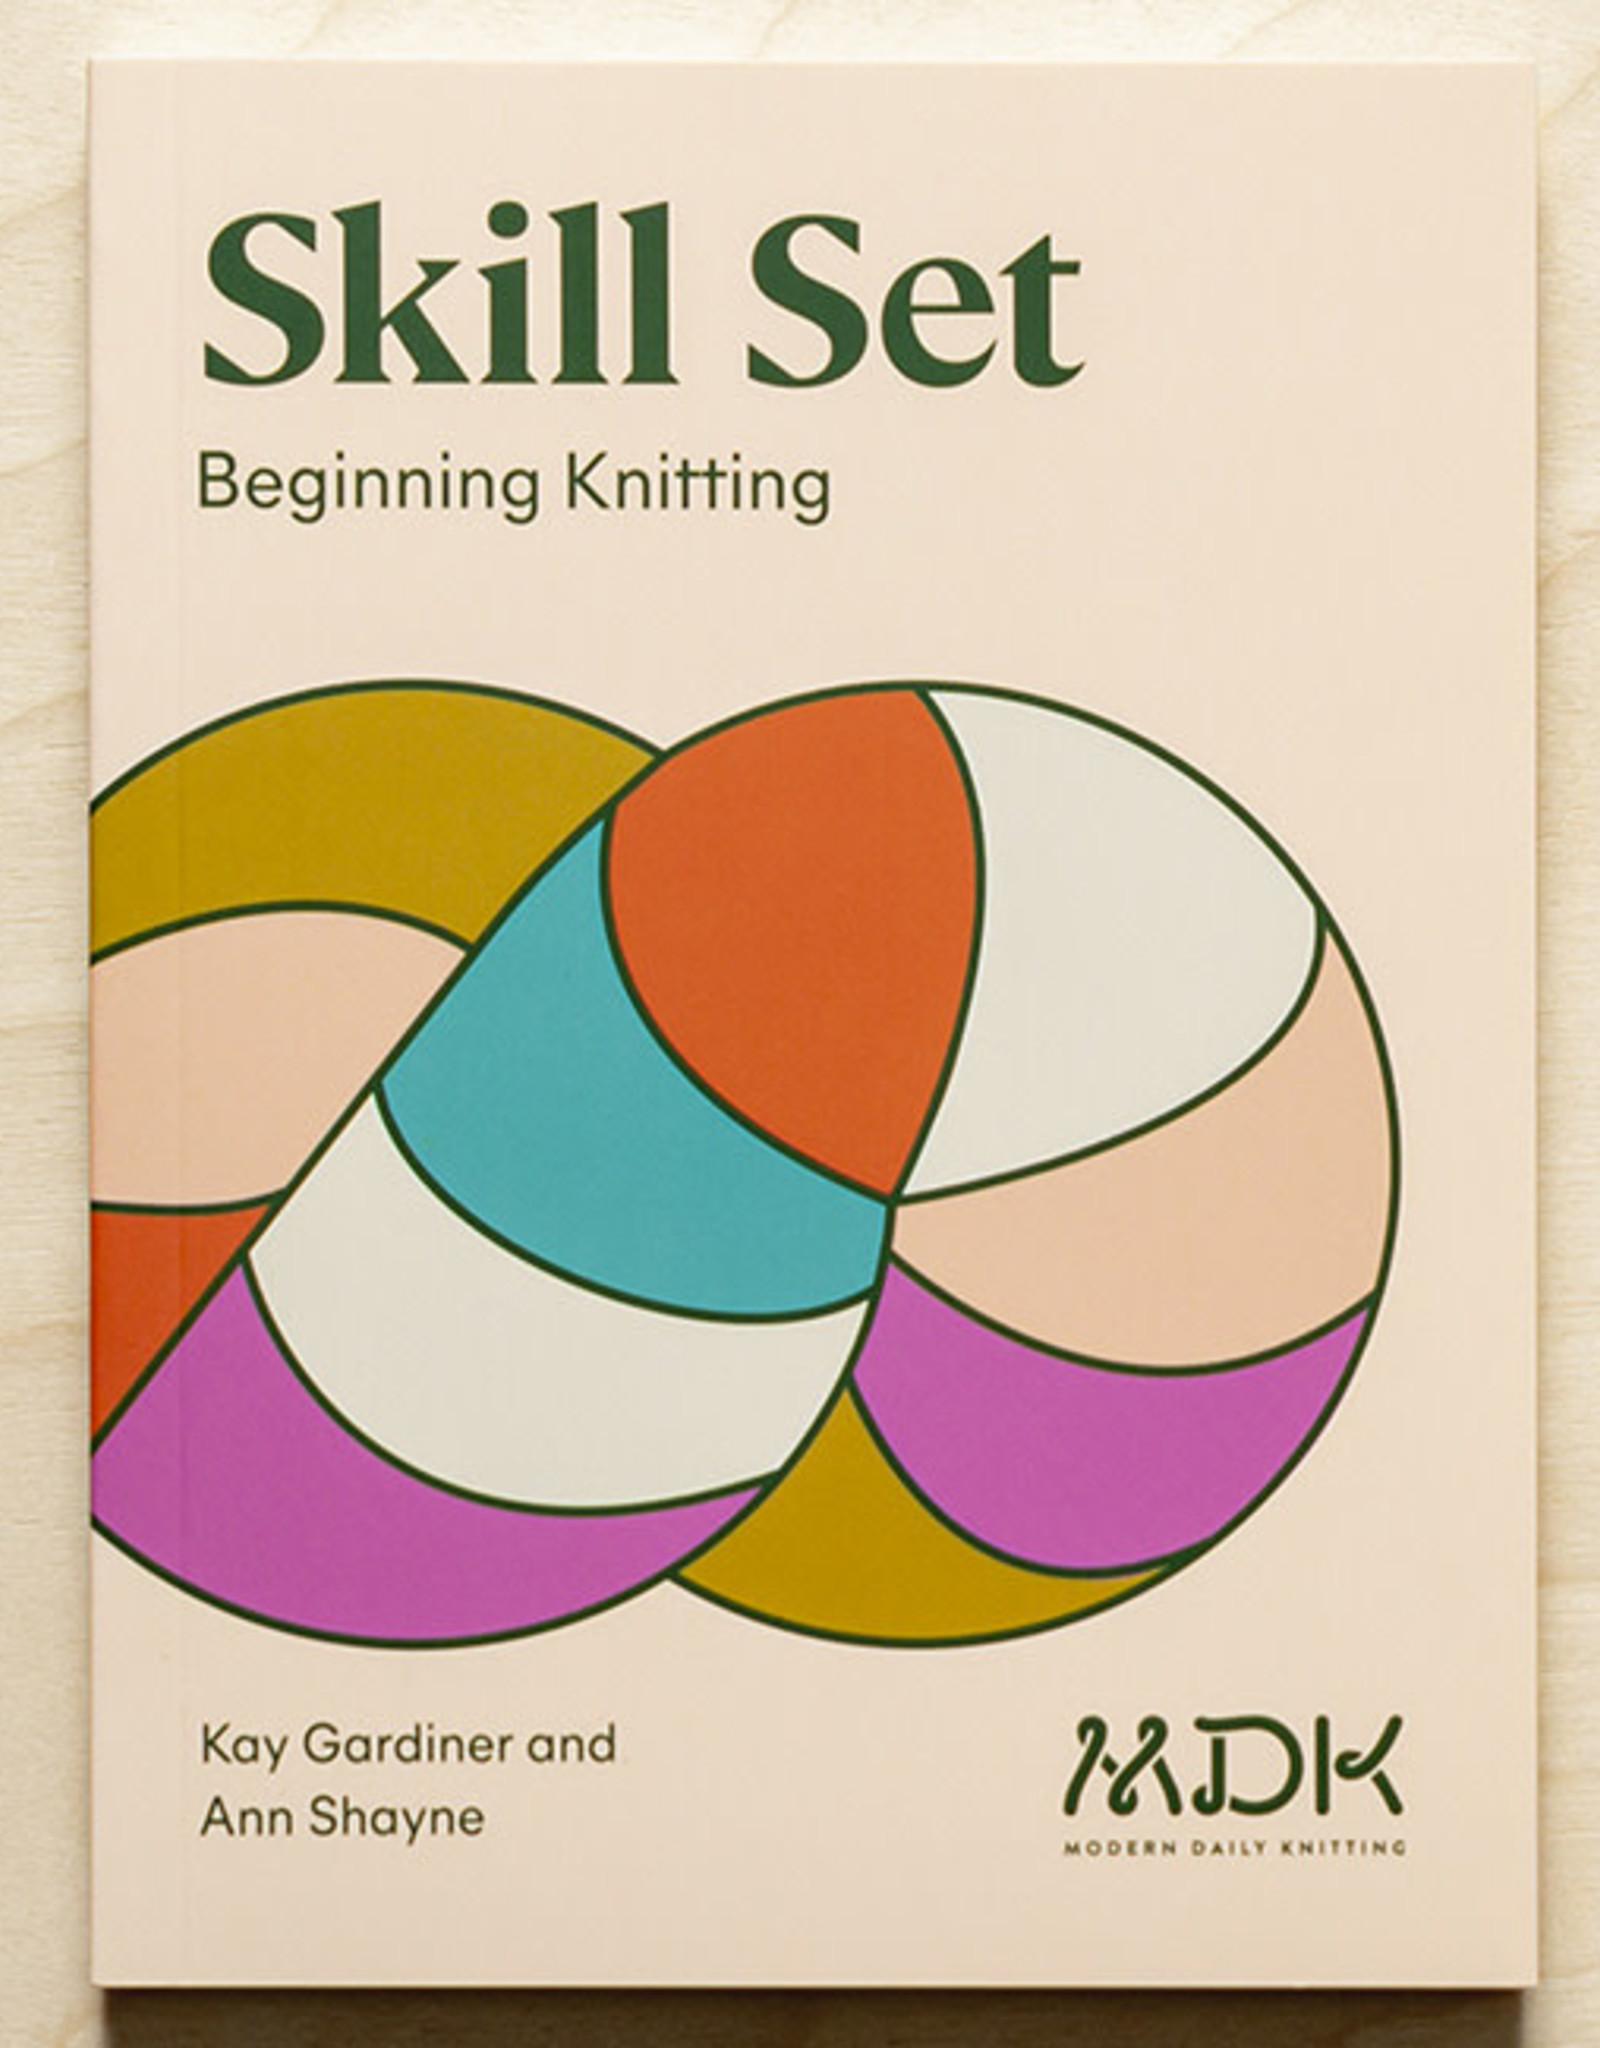 Modern Daily Knitting MDK Skill Set: Beginning Knitting